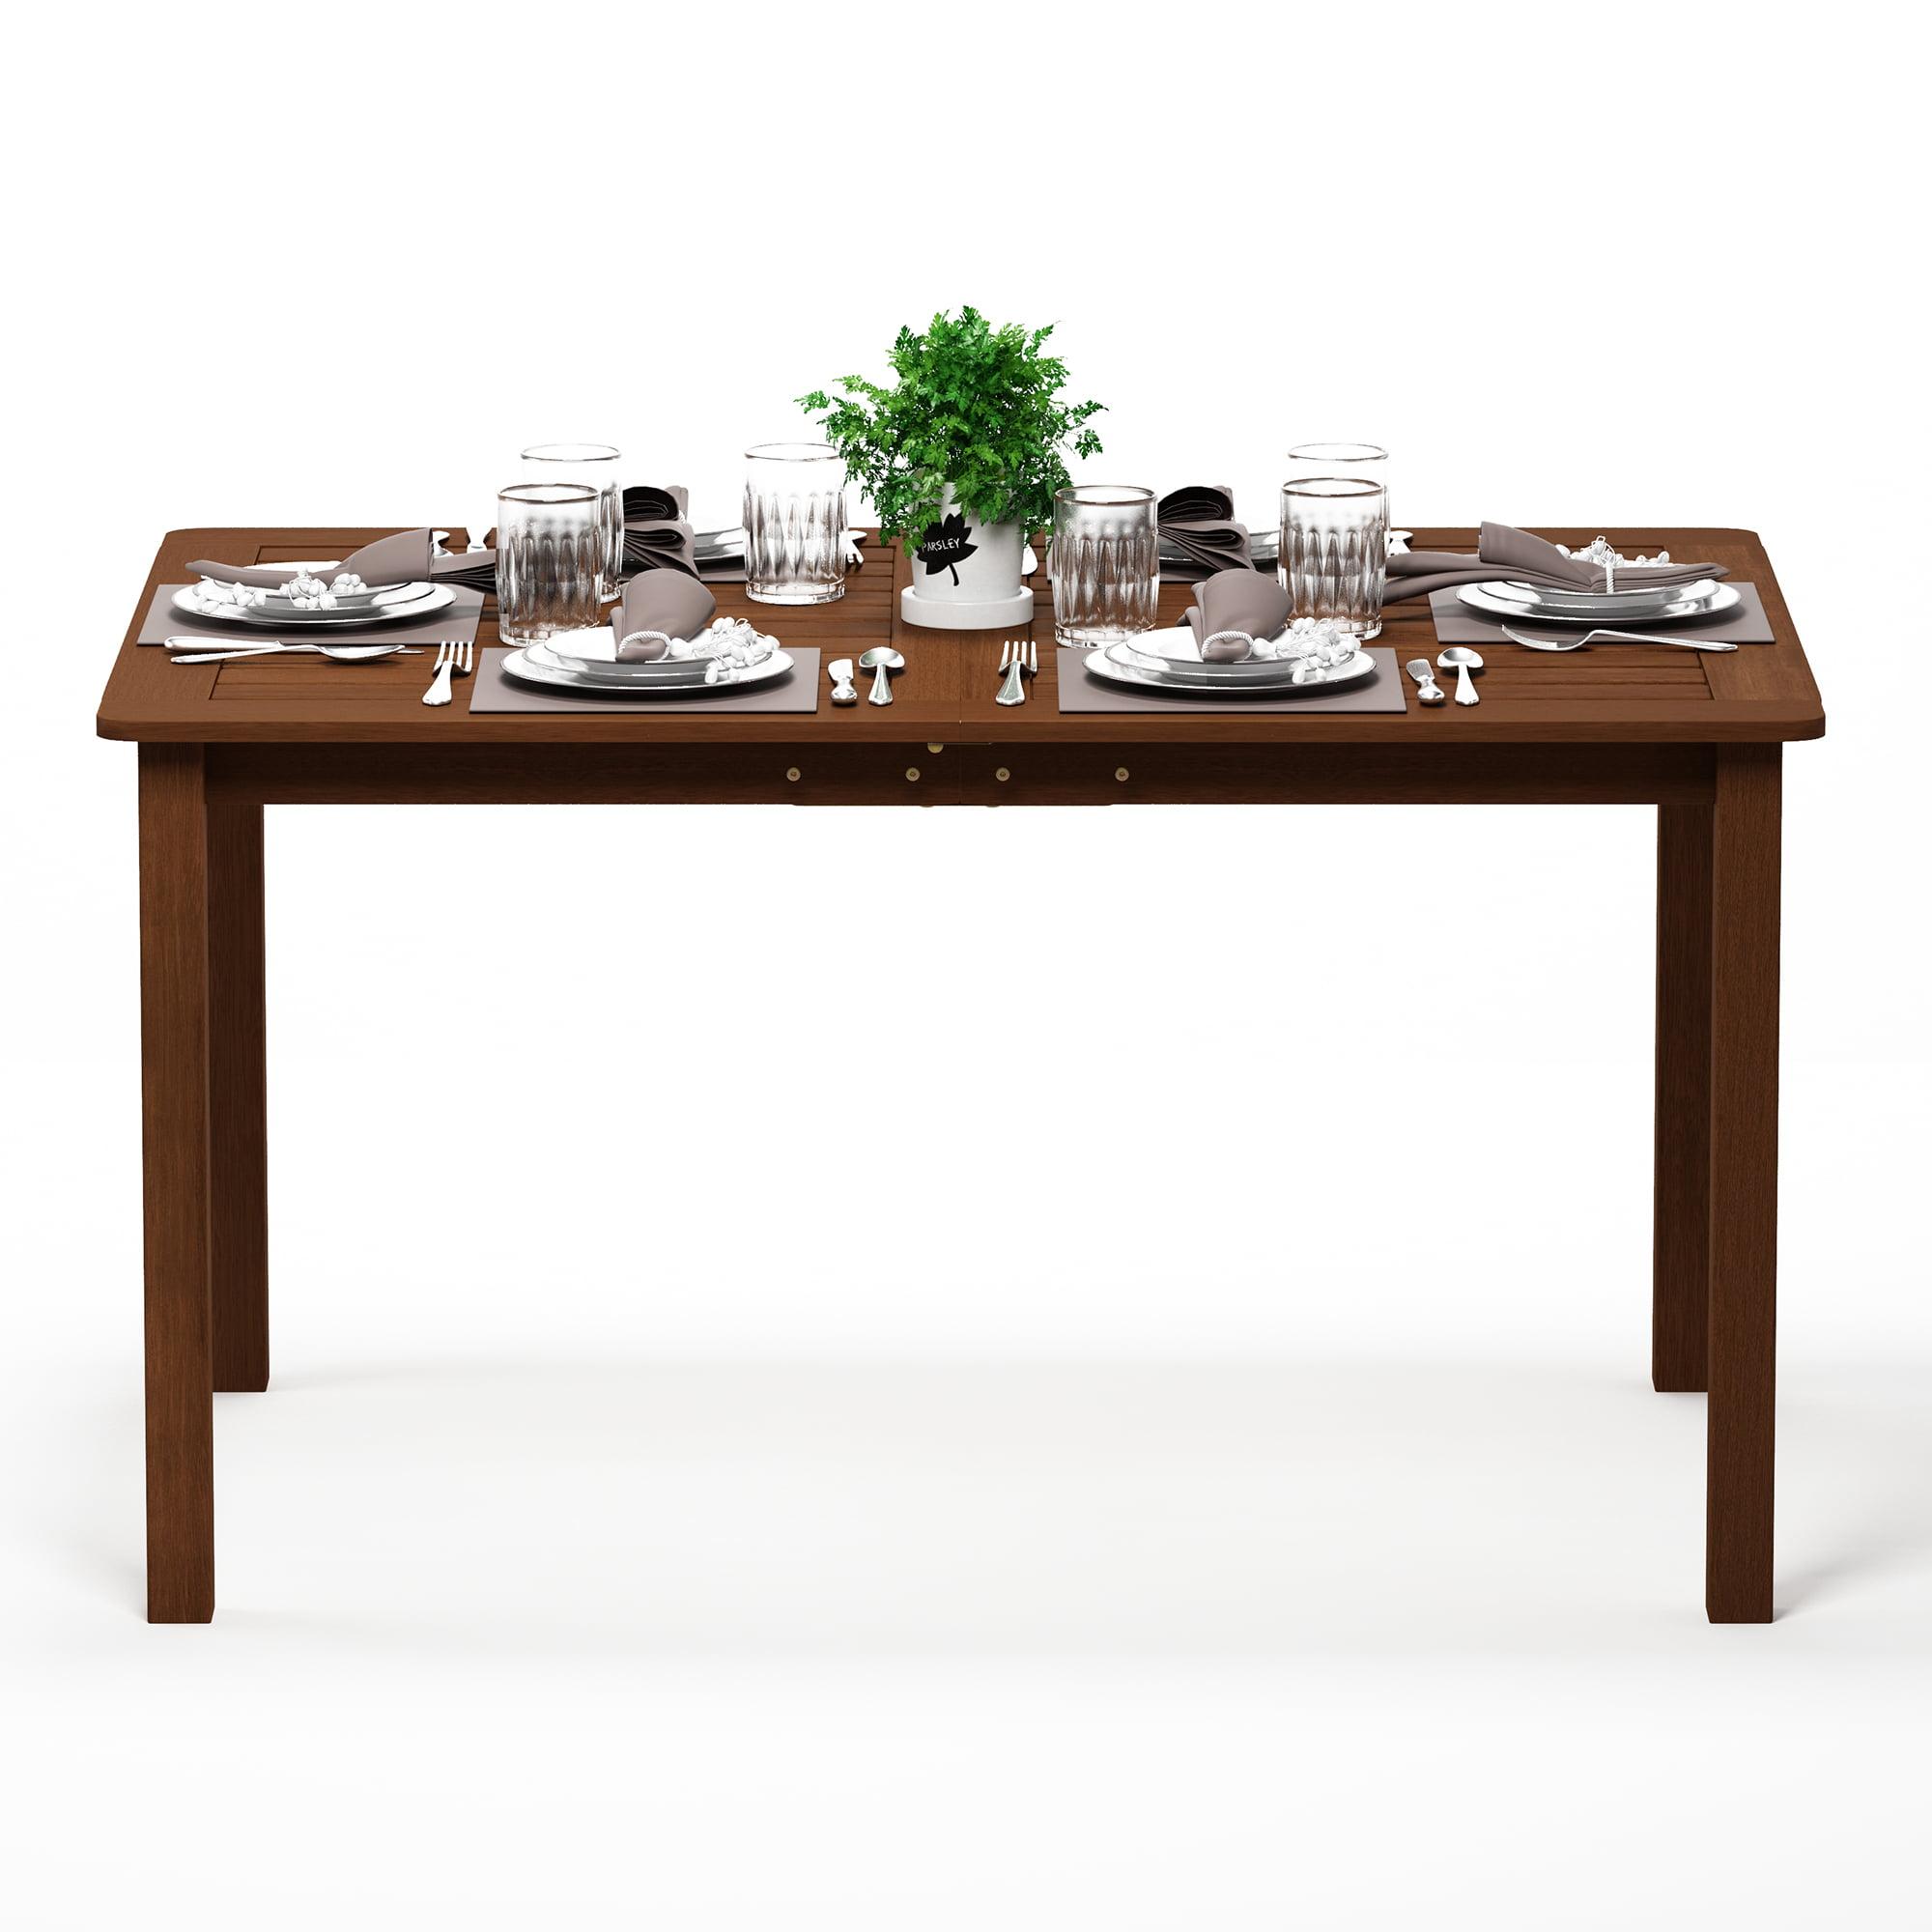 Furinno Tioman Hardwood Outdoor Dining Table, FG18070